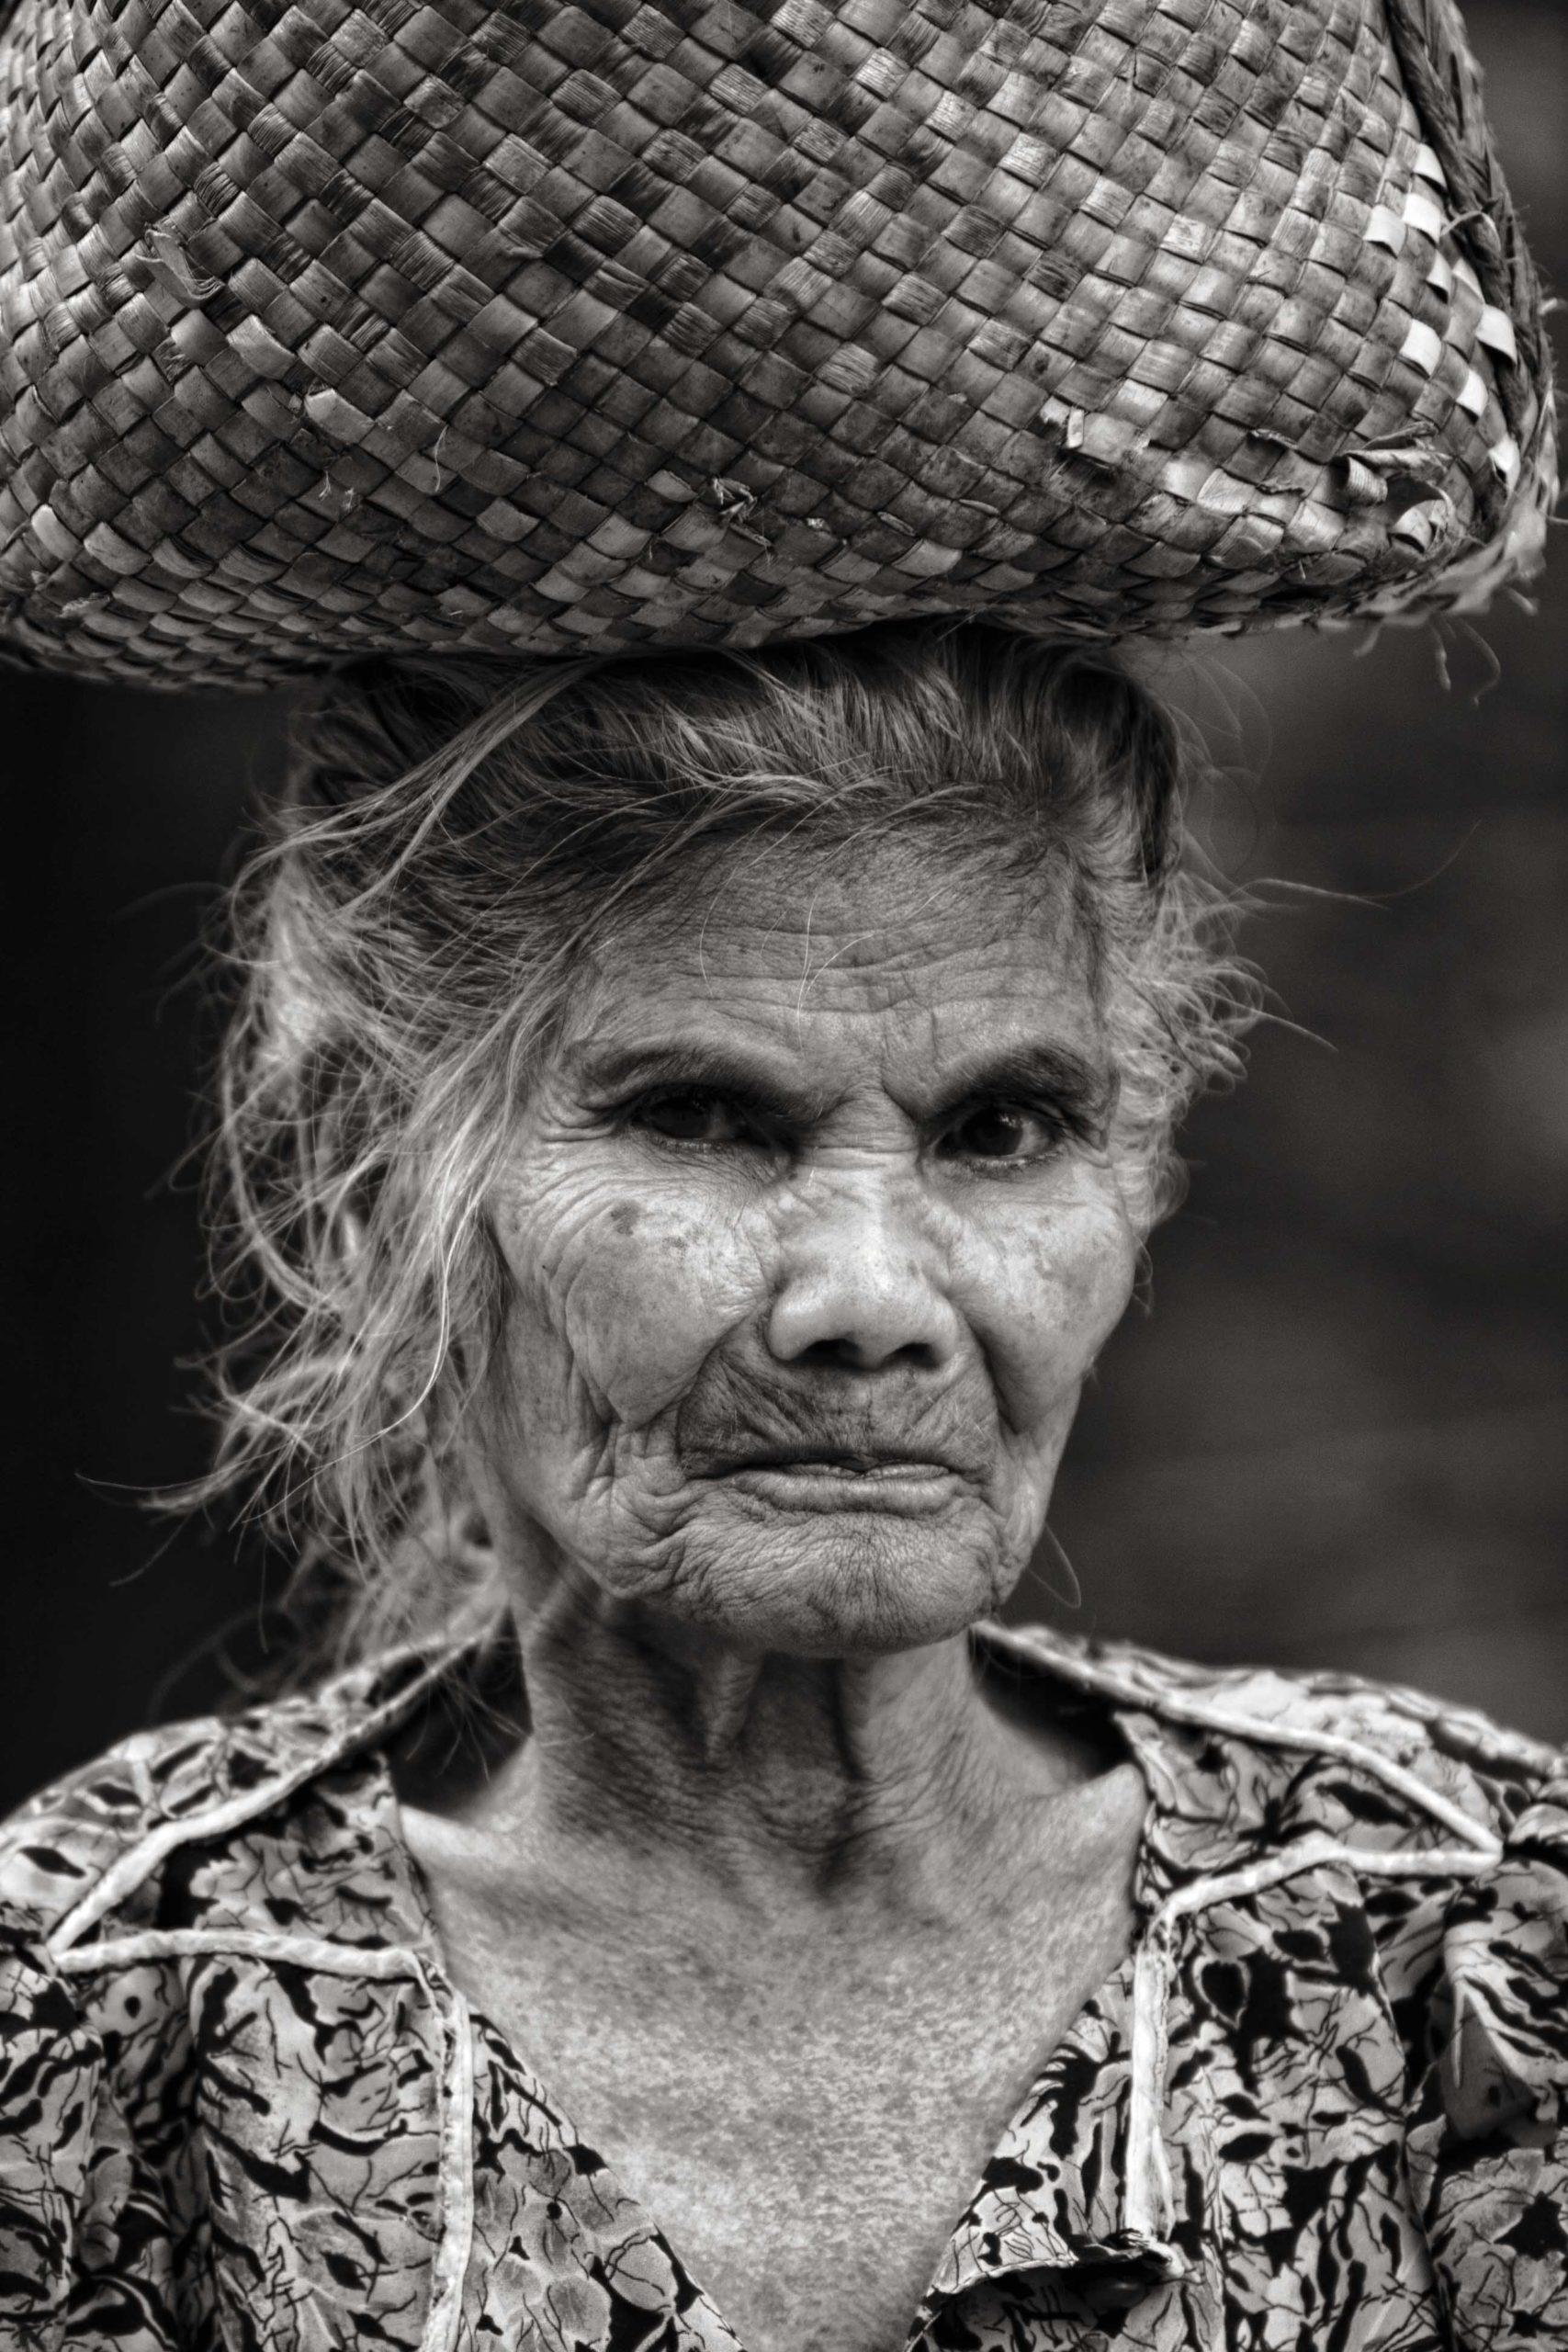 Indonesian Visage 33